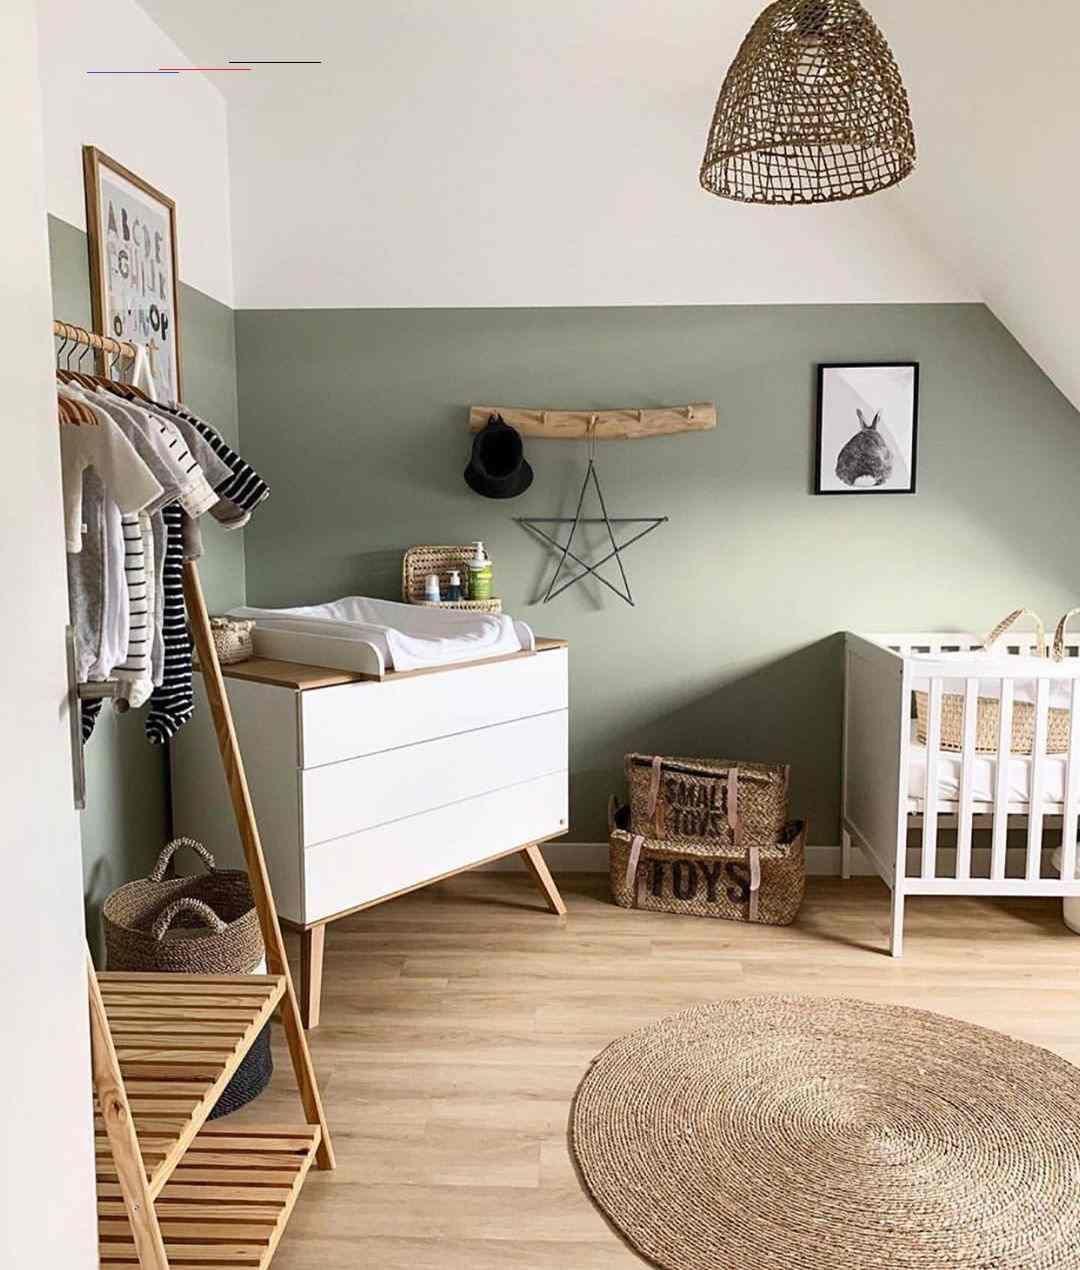 "Inspi_Deco on Instagram: ""️Kids Room �� LOVE � @maryline._ #instagood #instalike #likephoto #picoftheday #chambrebebe #babyboy #babyroom #amazingworld #passiondeco…"" - #playgrounddesign"